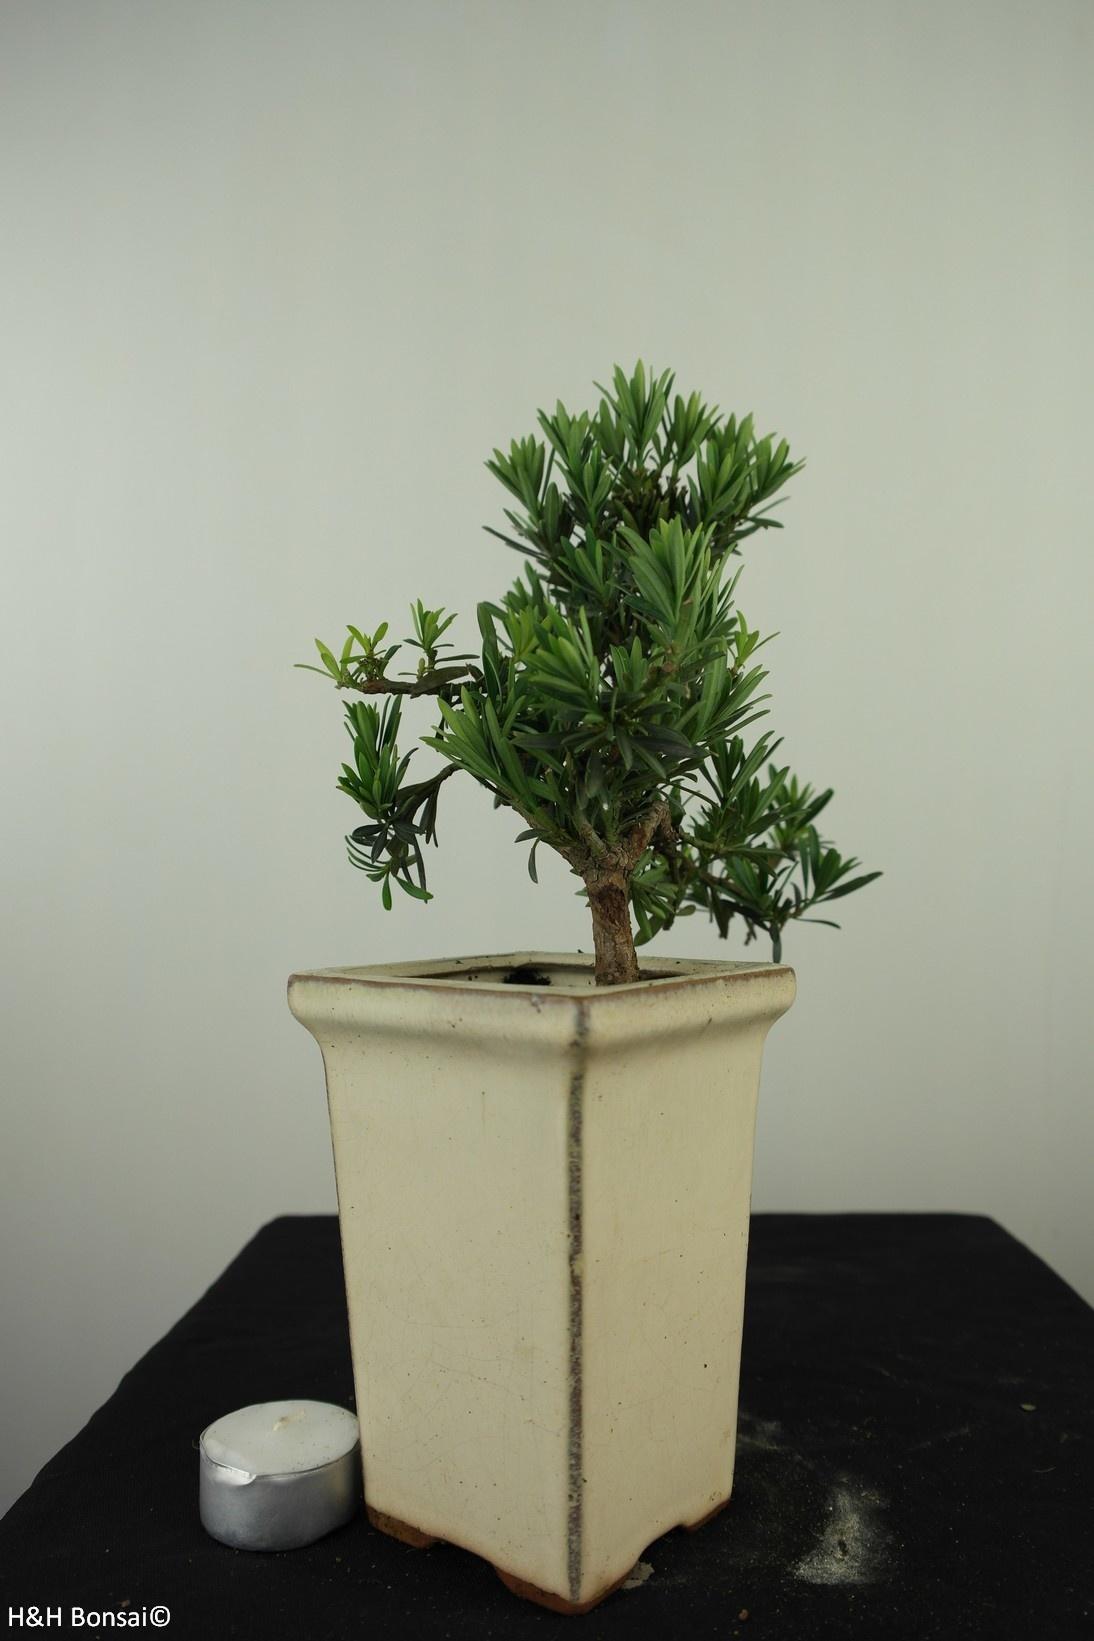 Bonsai Buddhist Pine, Podocarpus, no. 7600